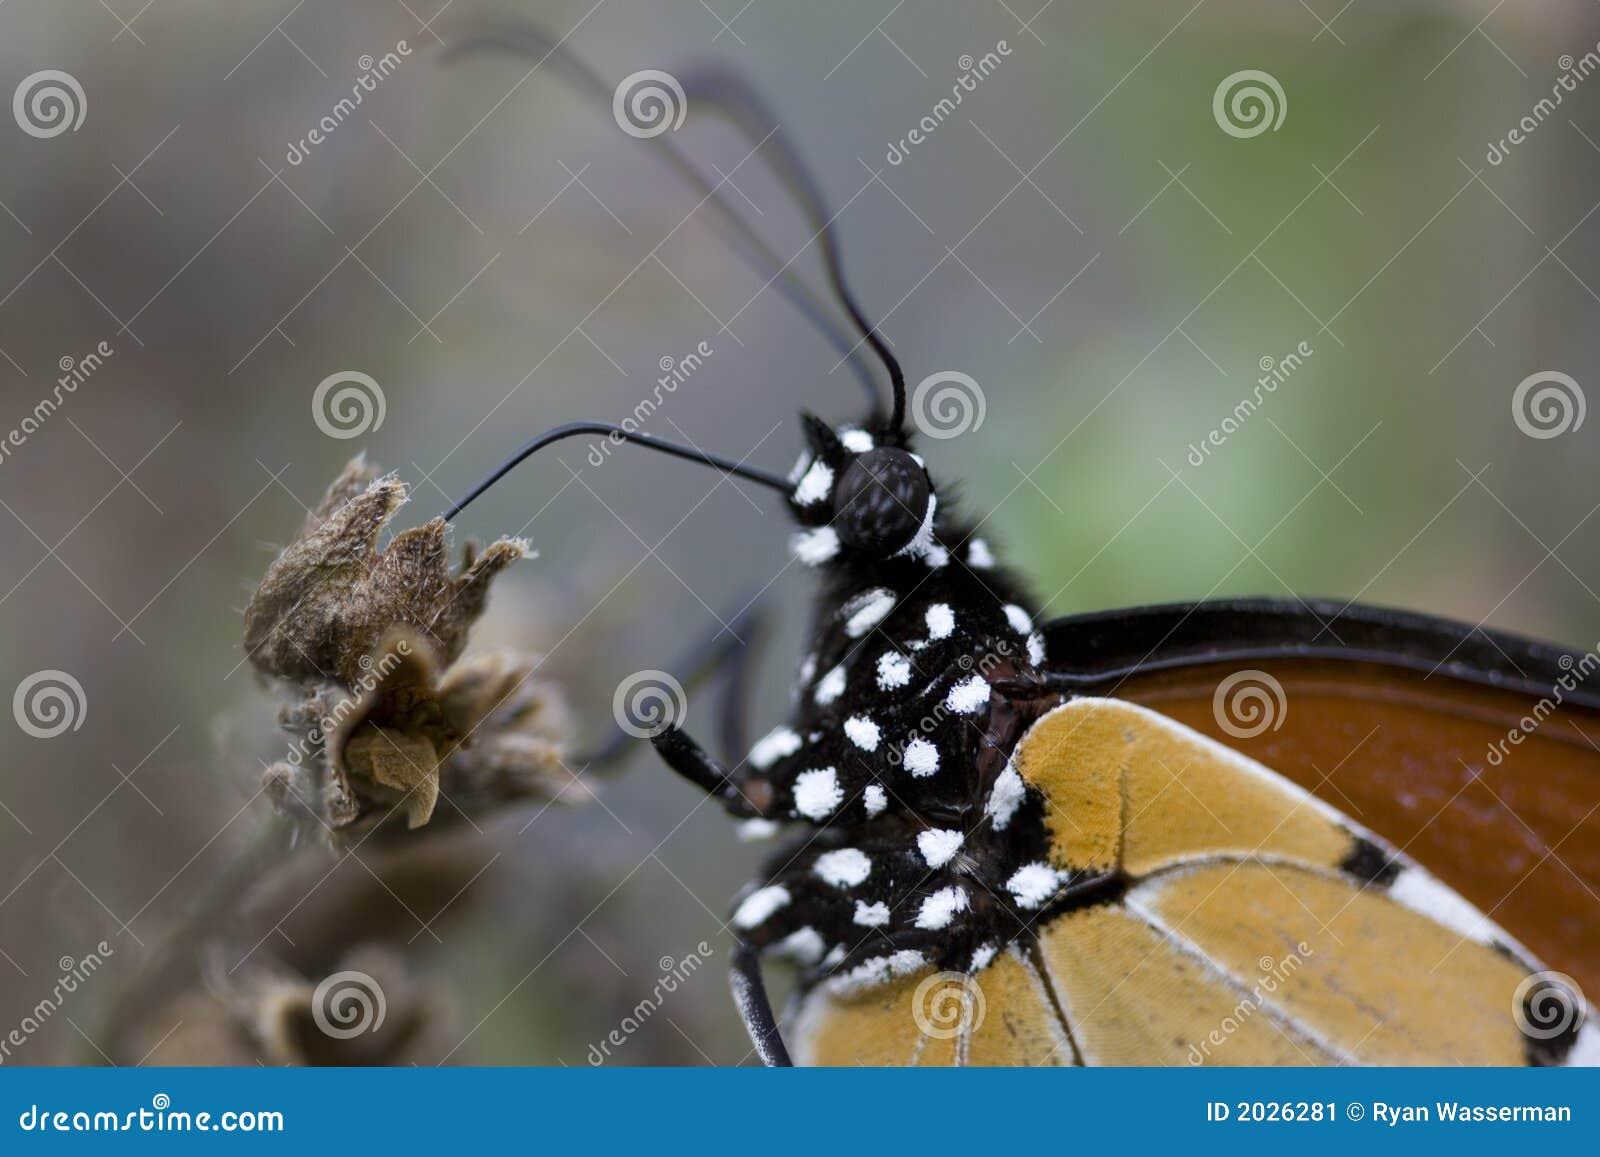 Monarch butterfly body - photo#17